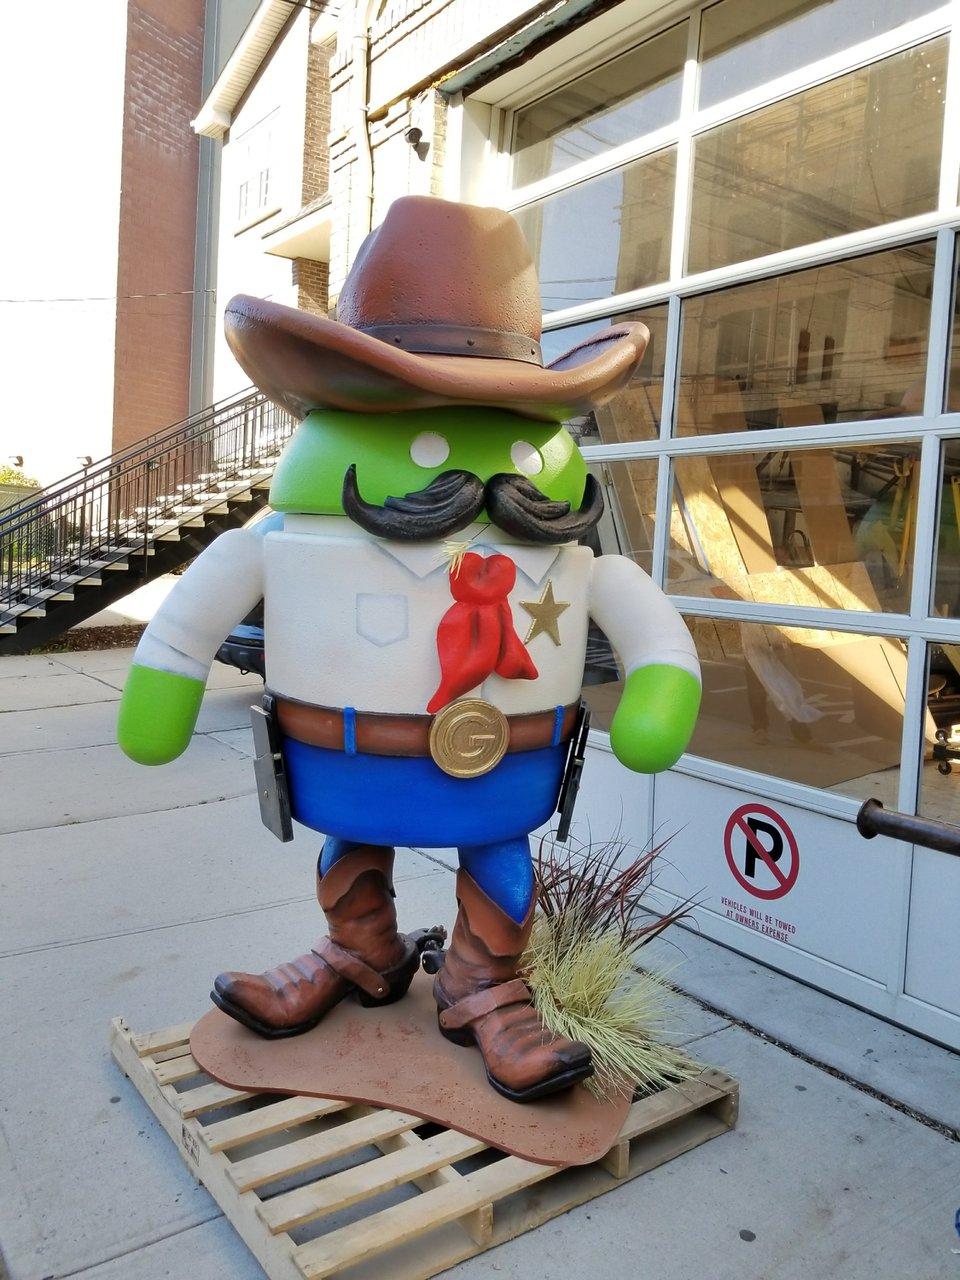 Texas Google Android photo 20170922_152732.jpg